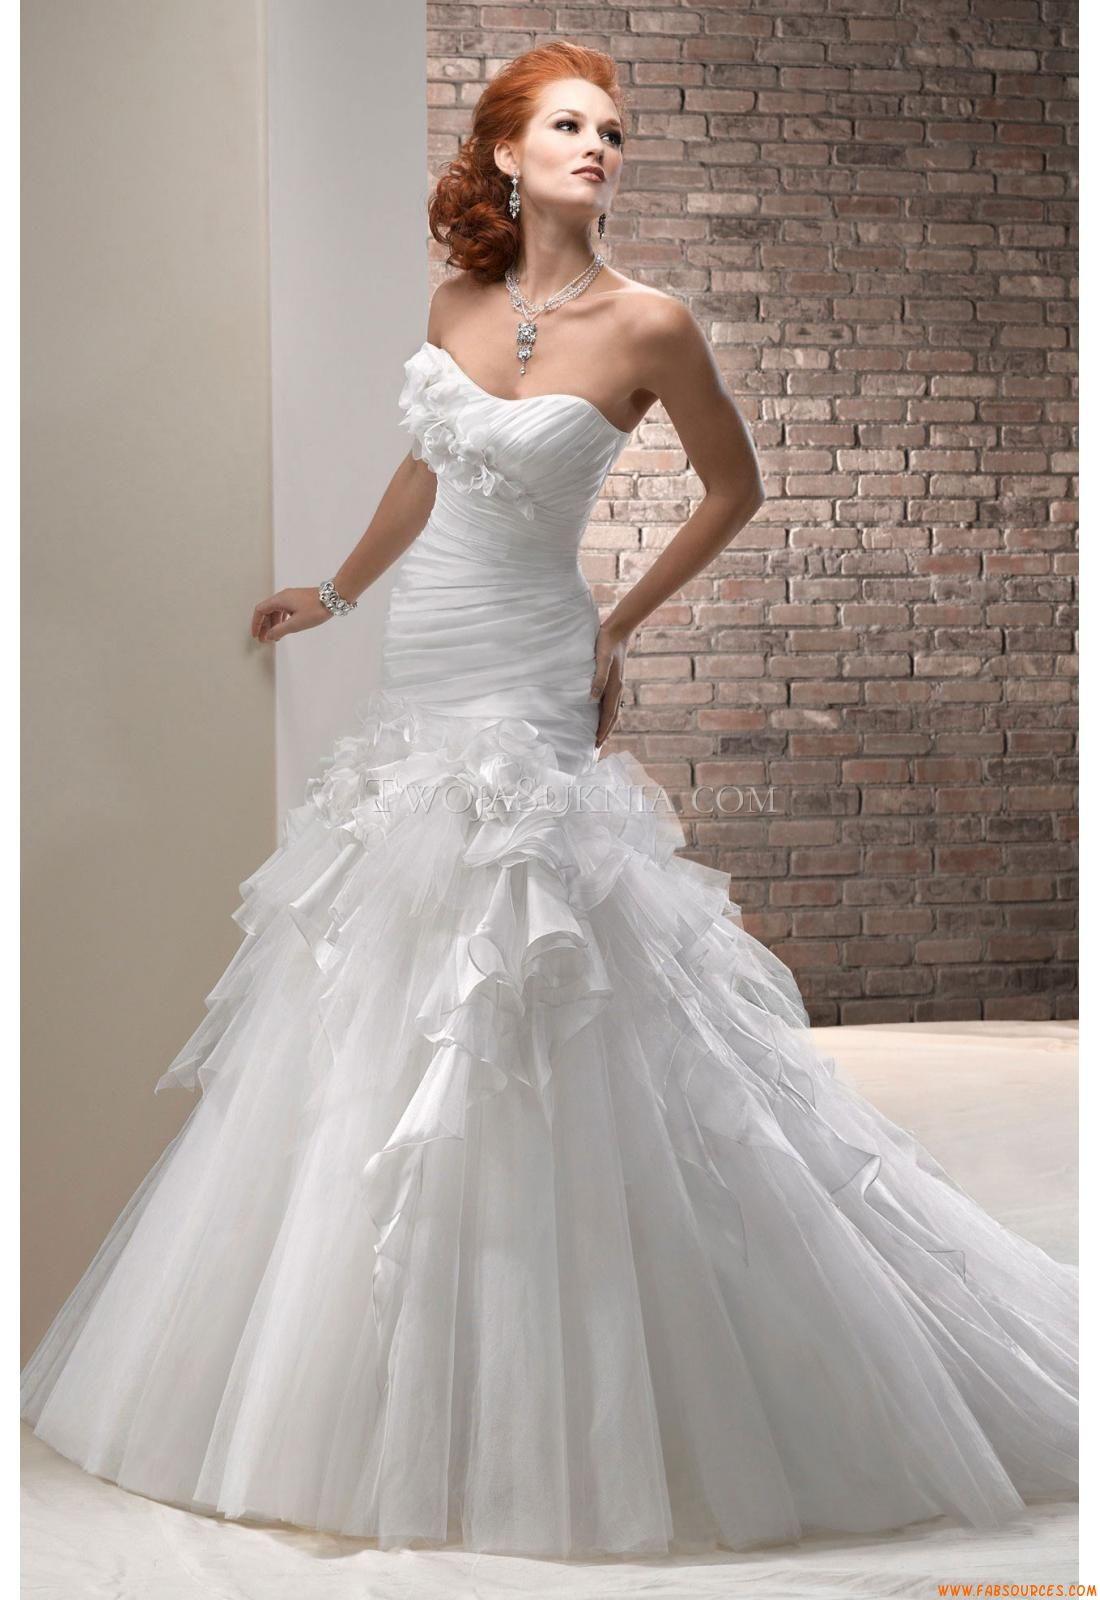 Robes de mariée maggie sottero elra divina robe de mariage haut